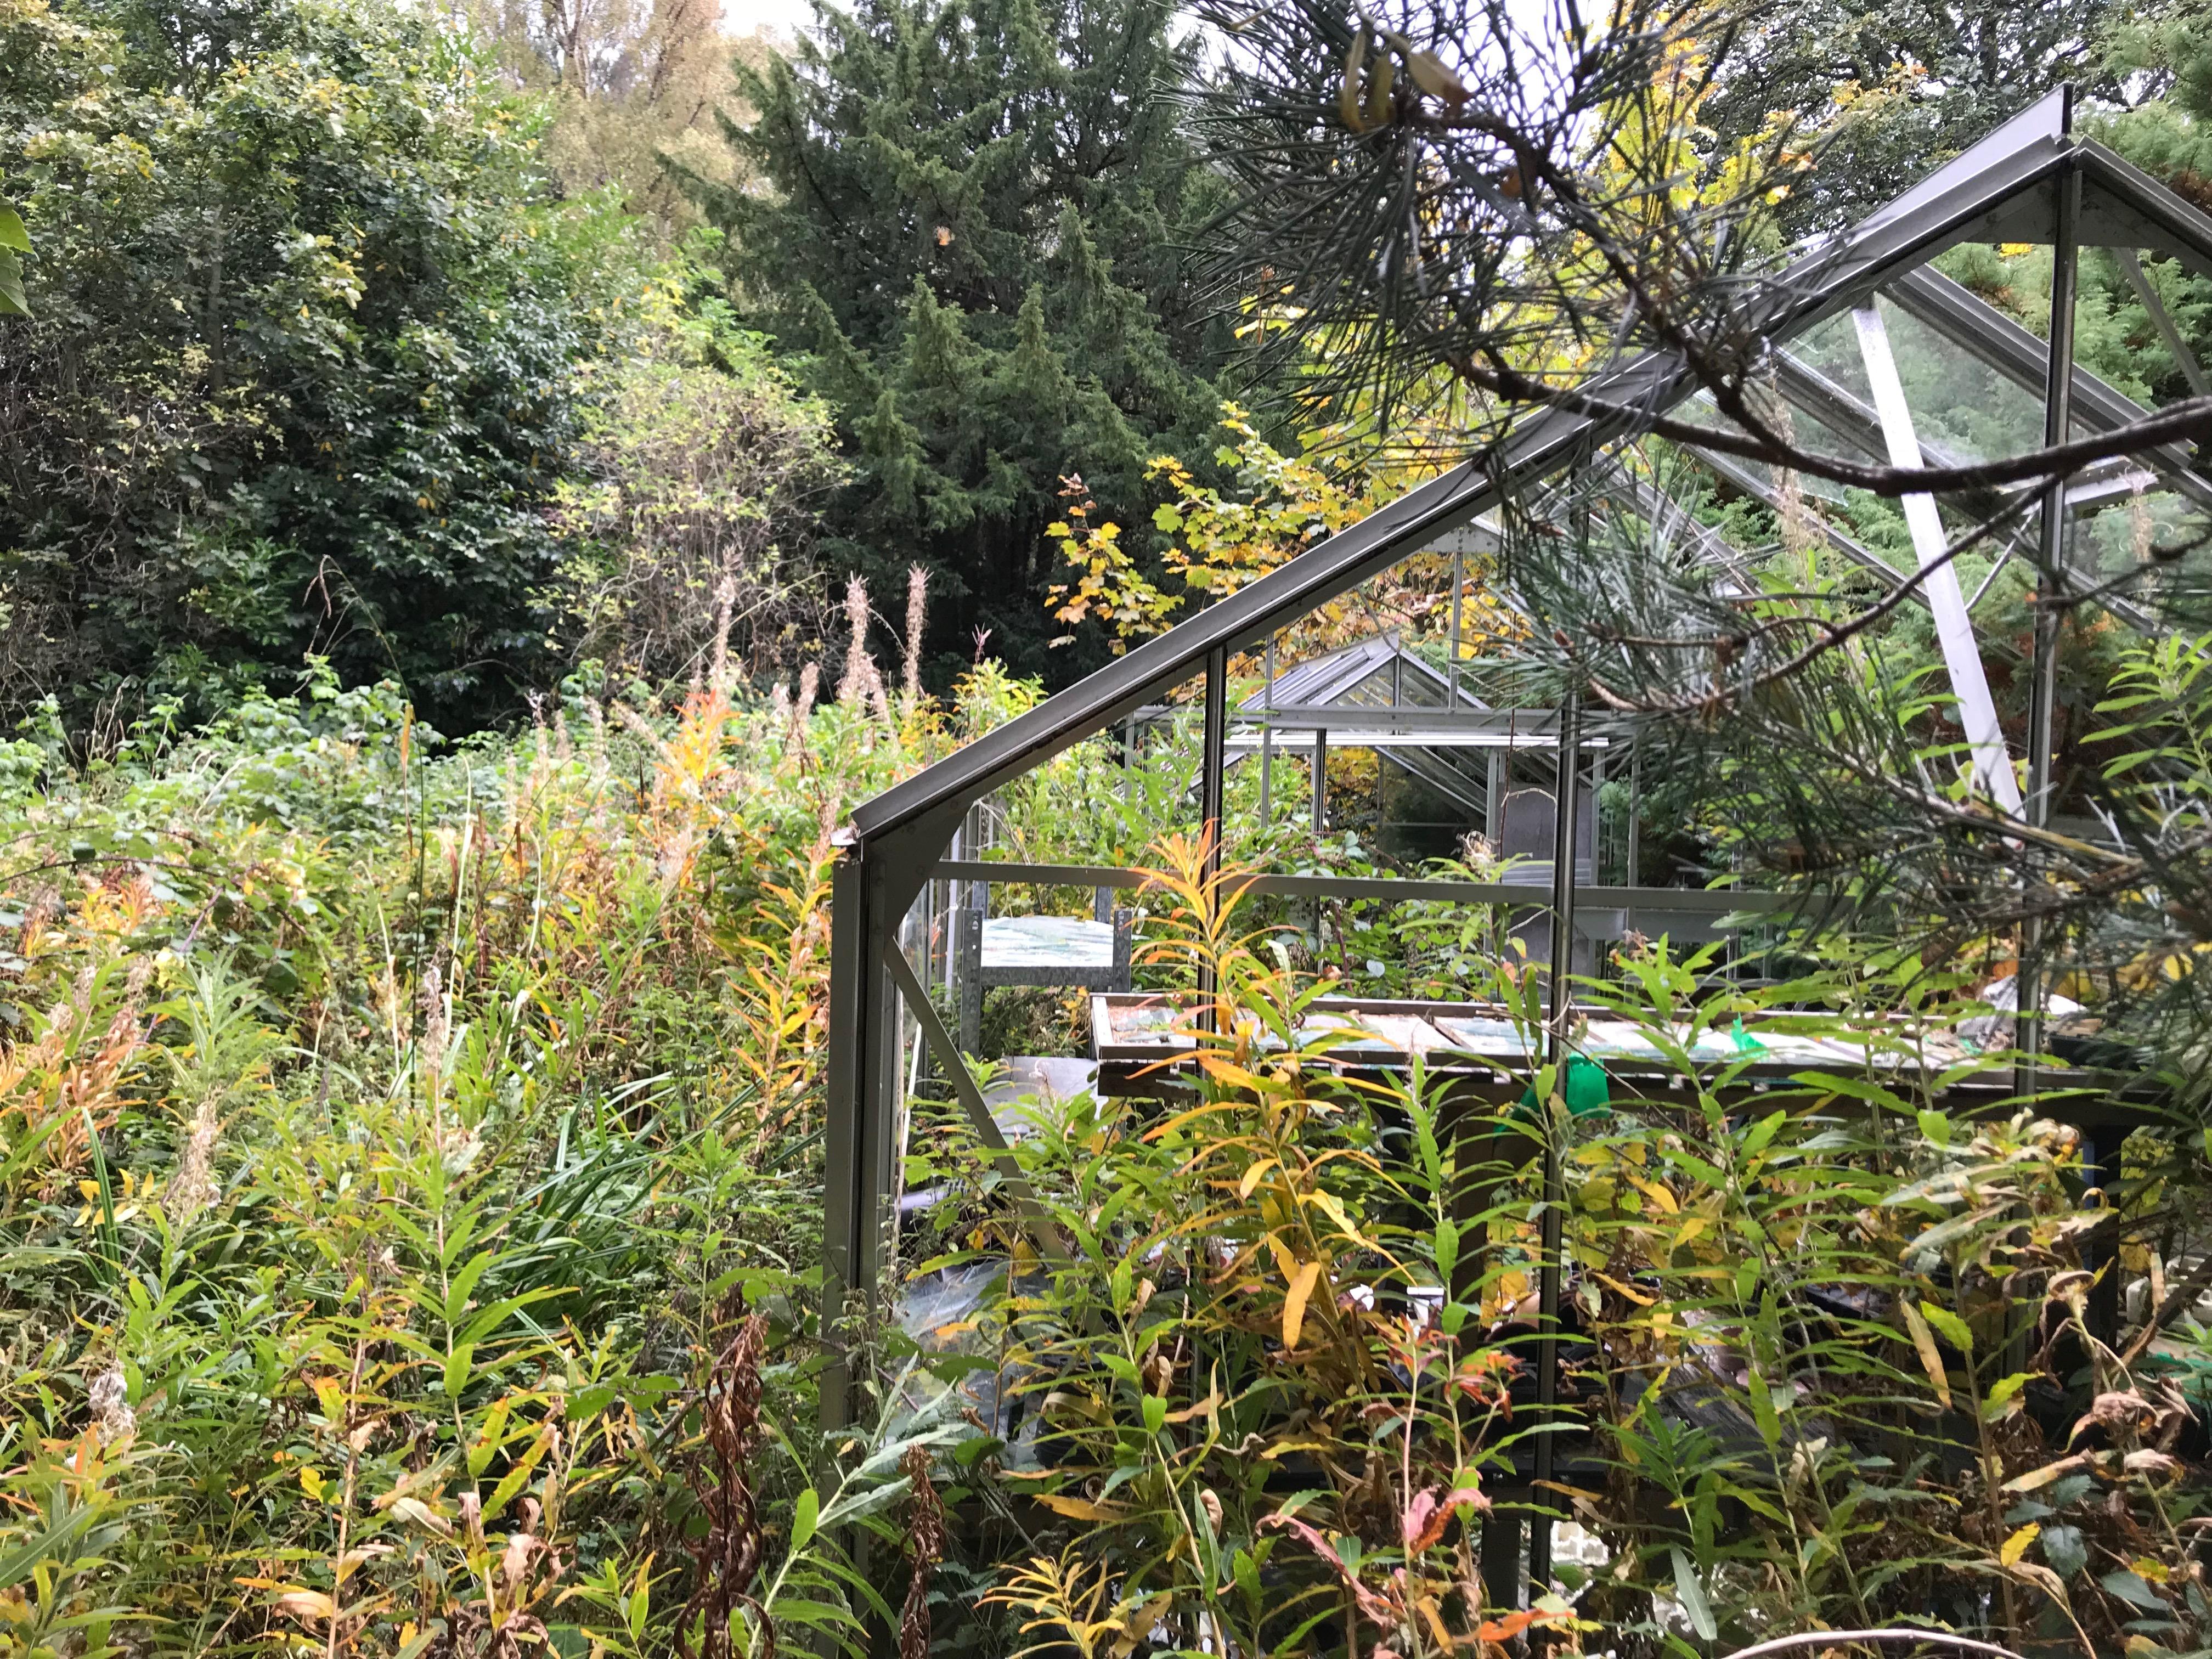 Greenhouses in the overgrown, abandoned garden